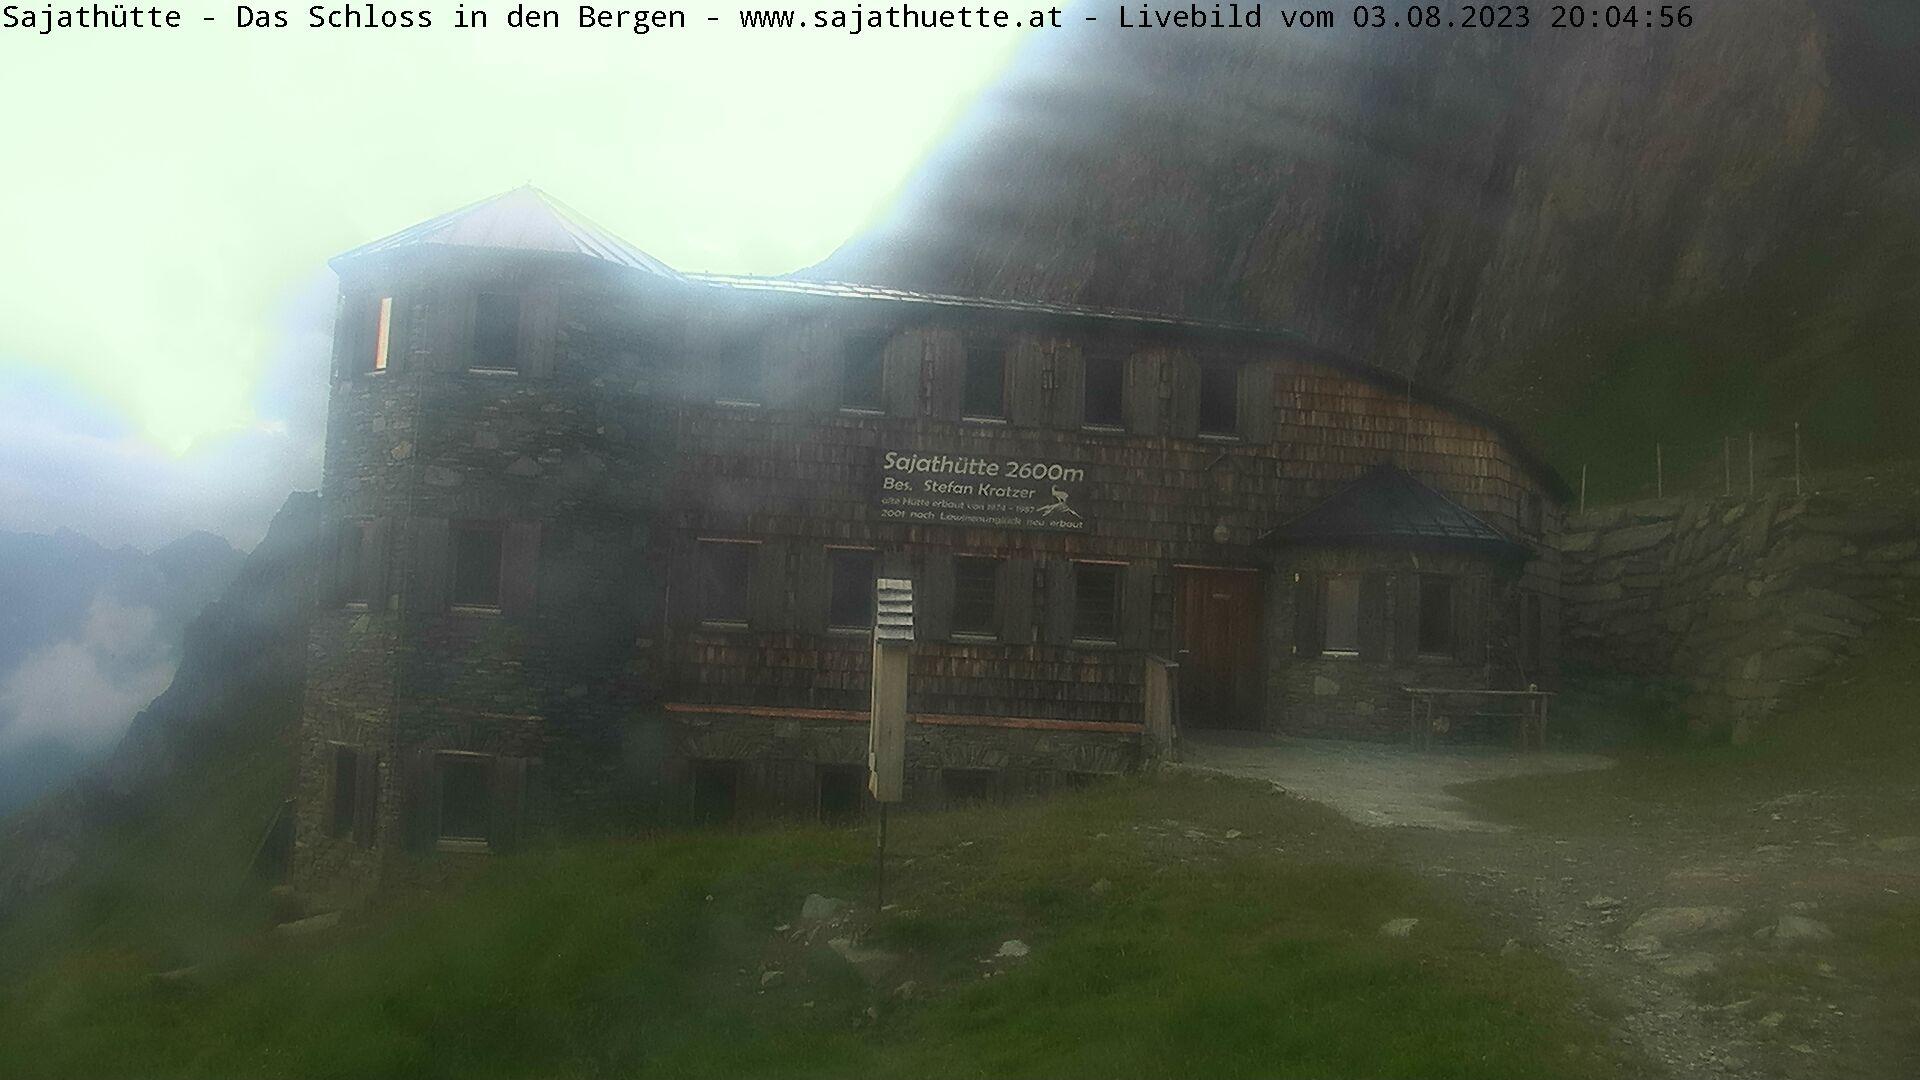 Webcam Webcam Sajathütte - Aktuelles Live-Bild aus 2.600m Seehöhe © www.sajathuette.at